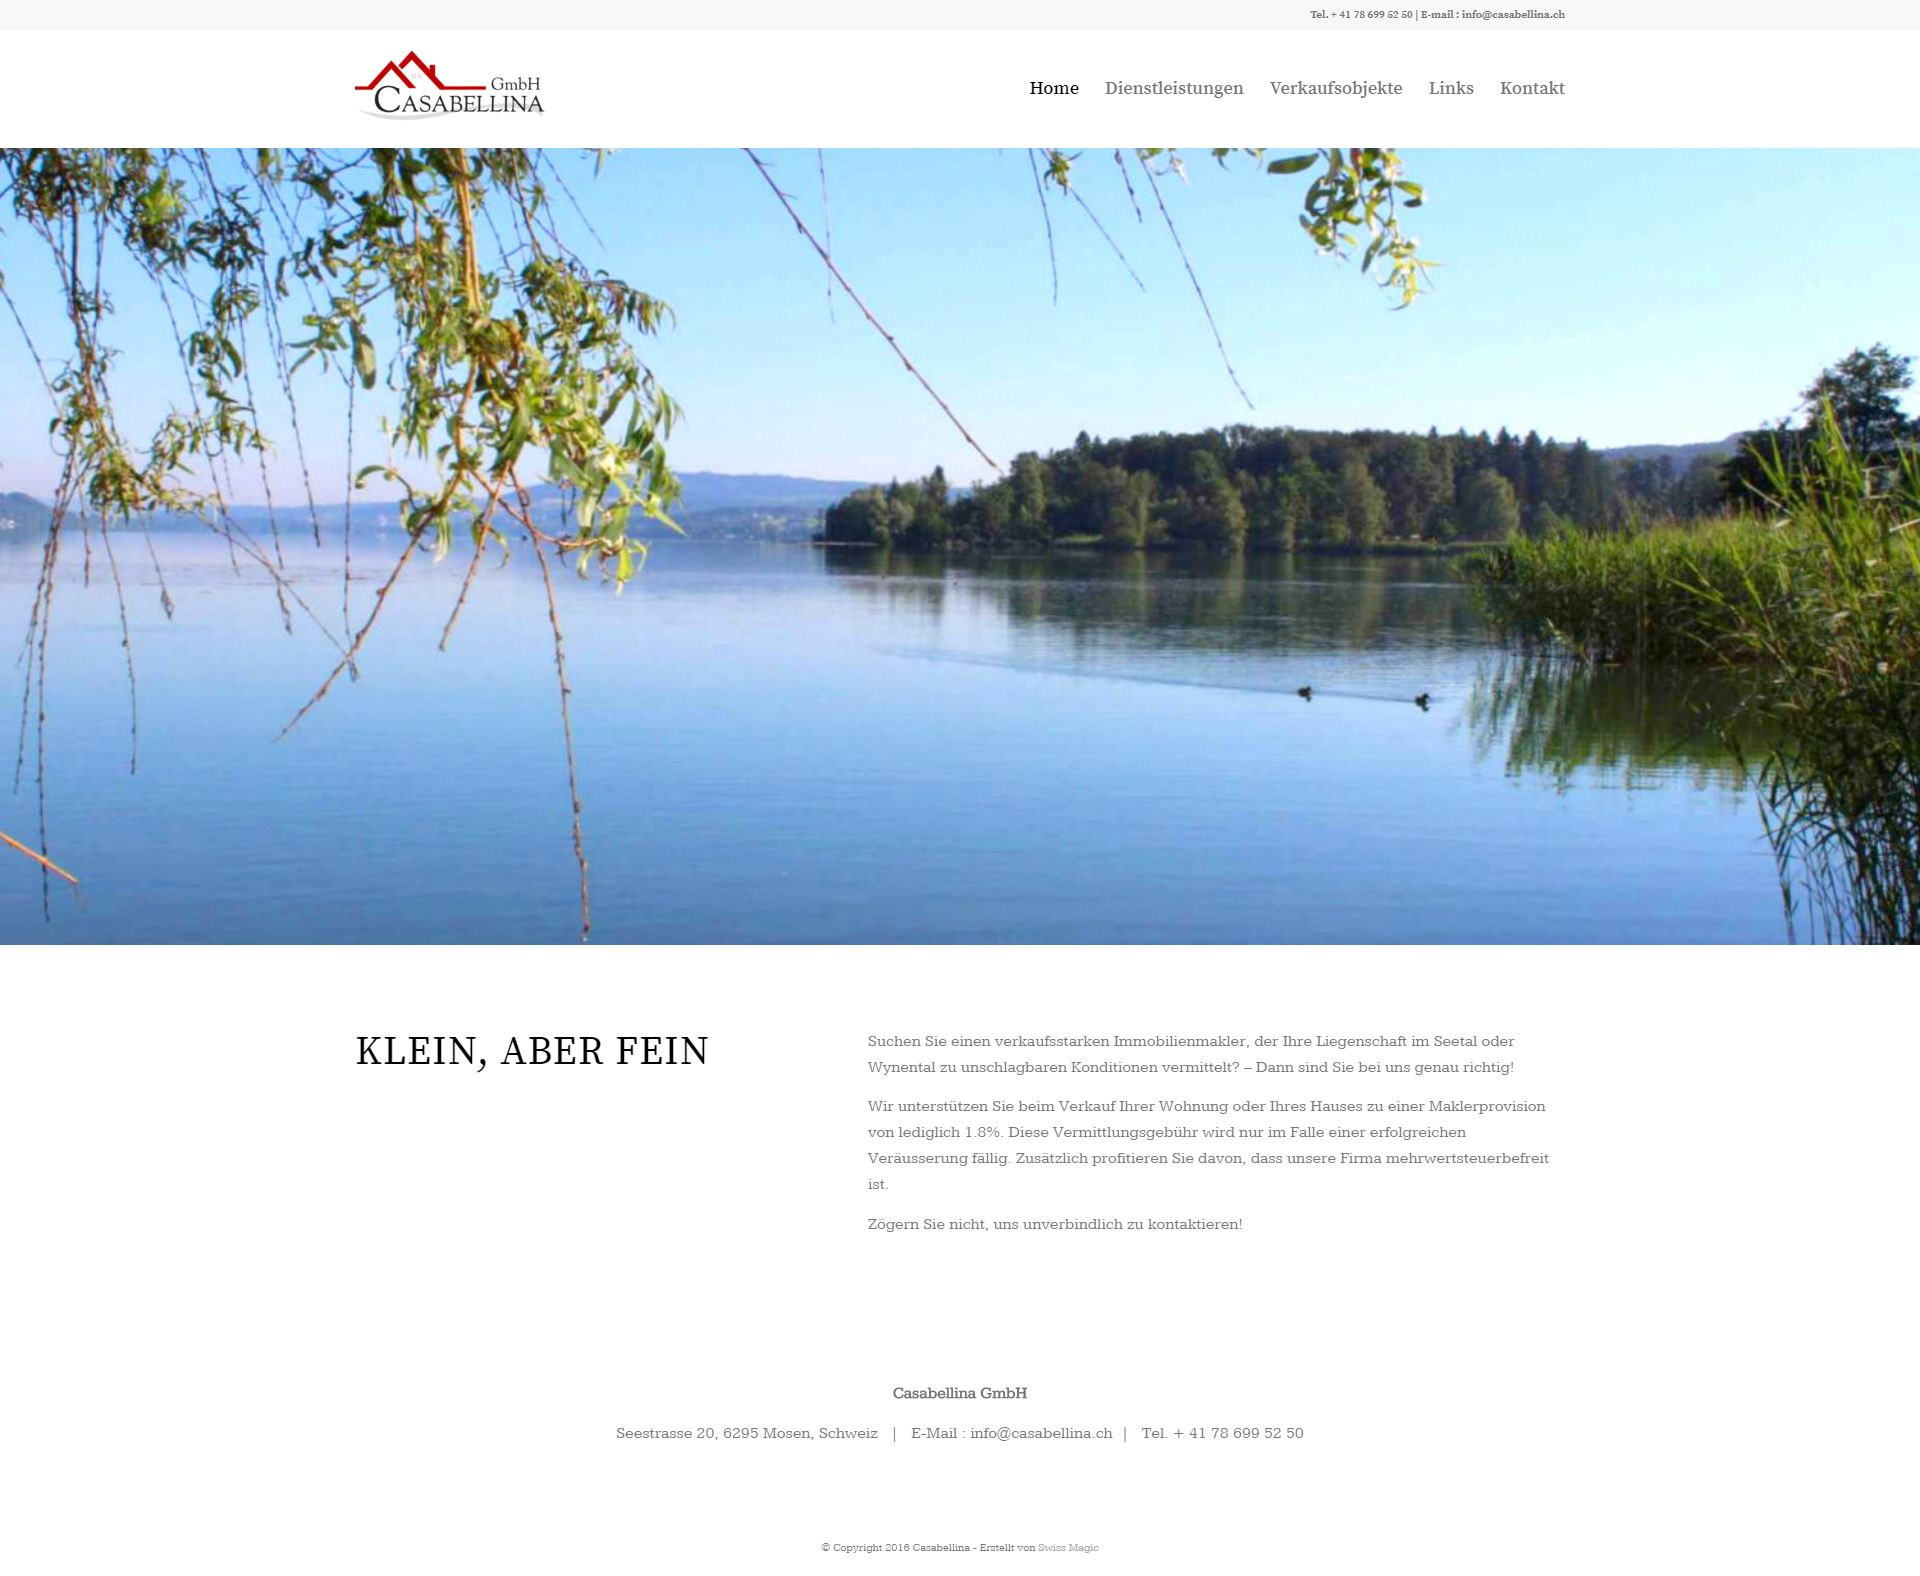 Webseite Portfolio Immobilien small